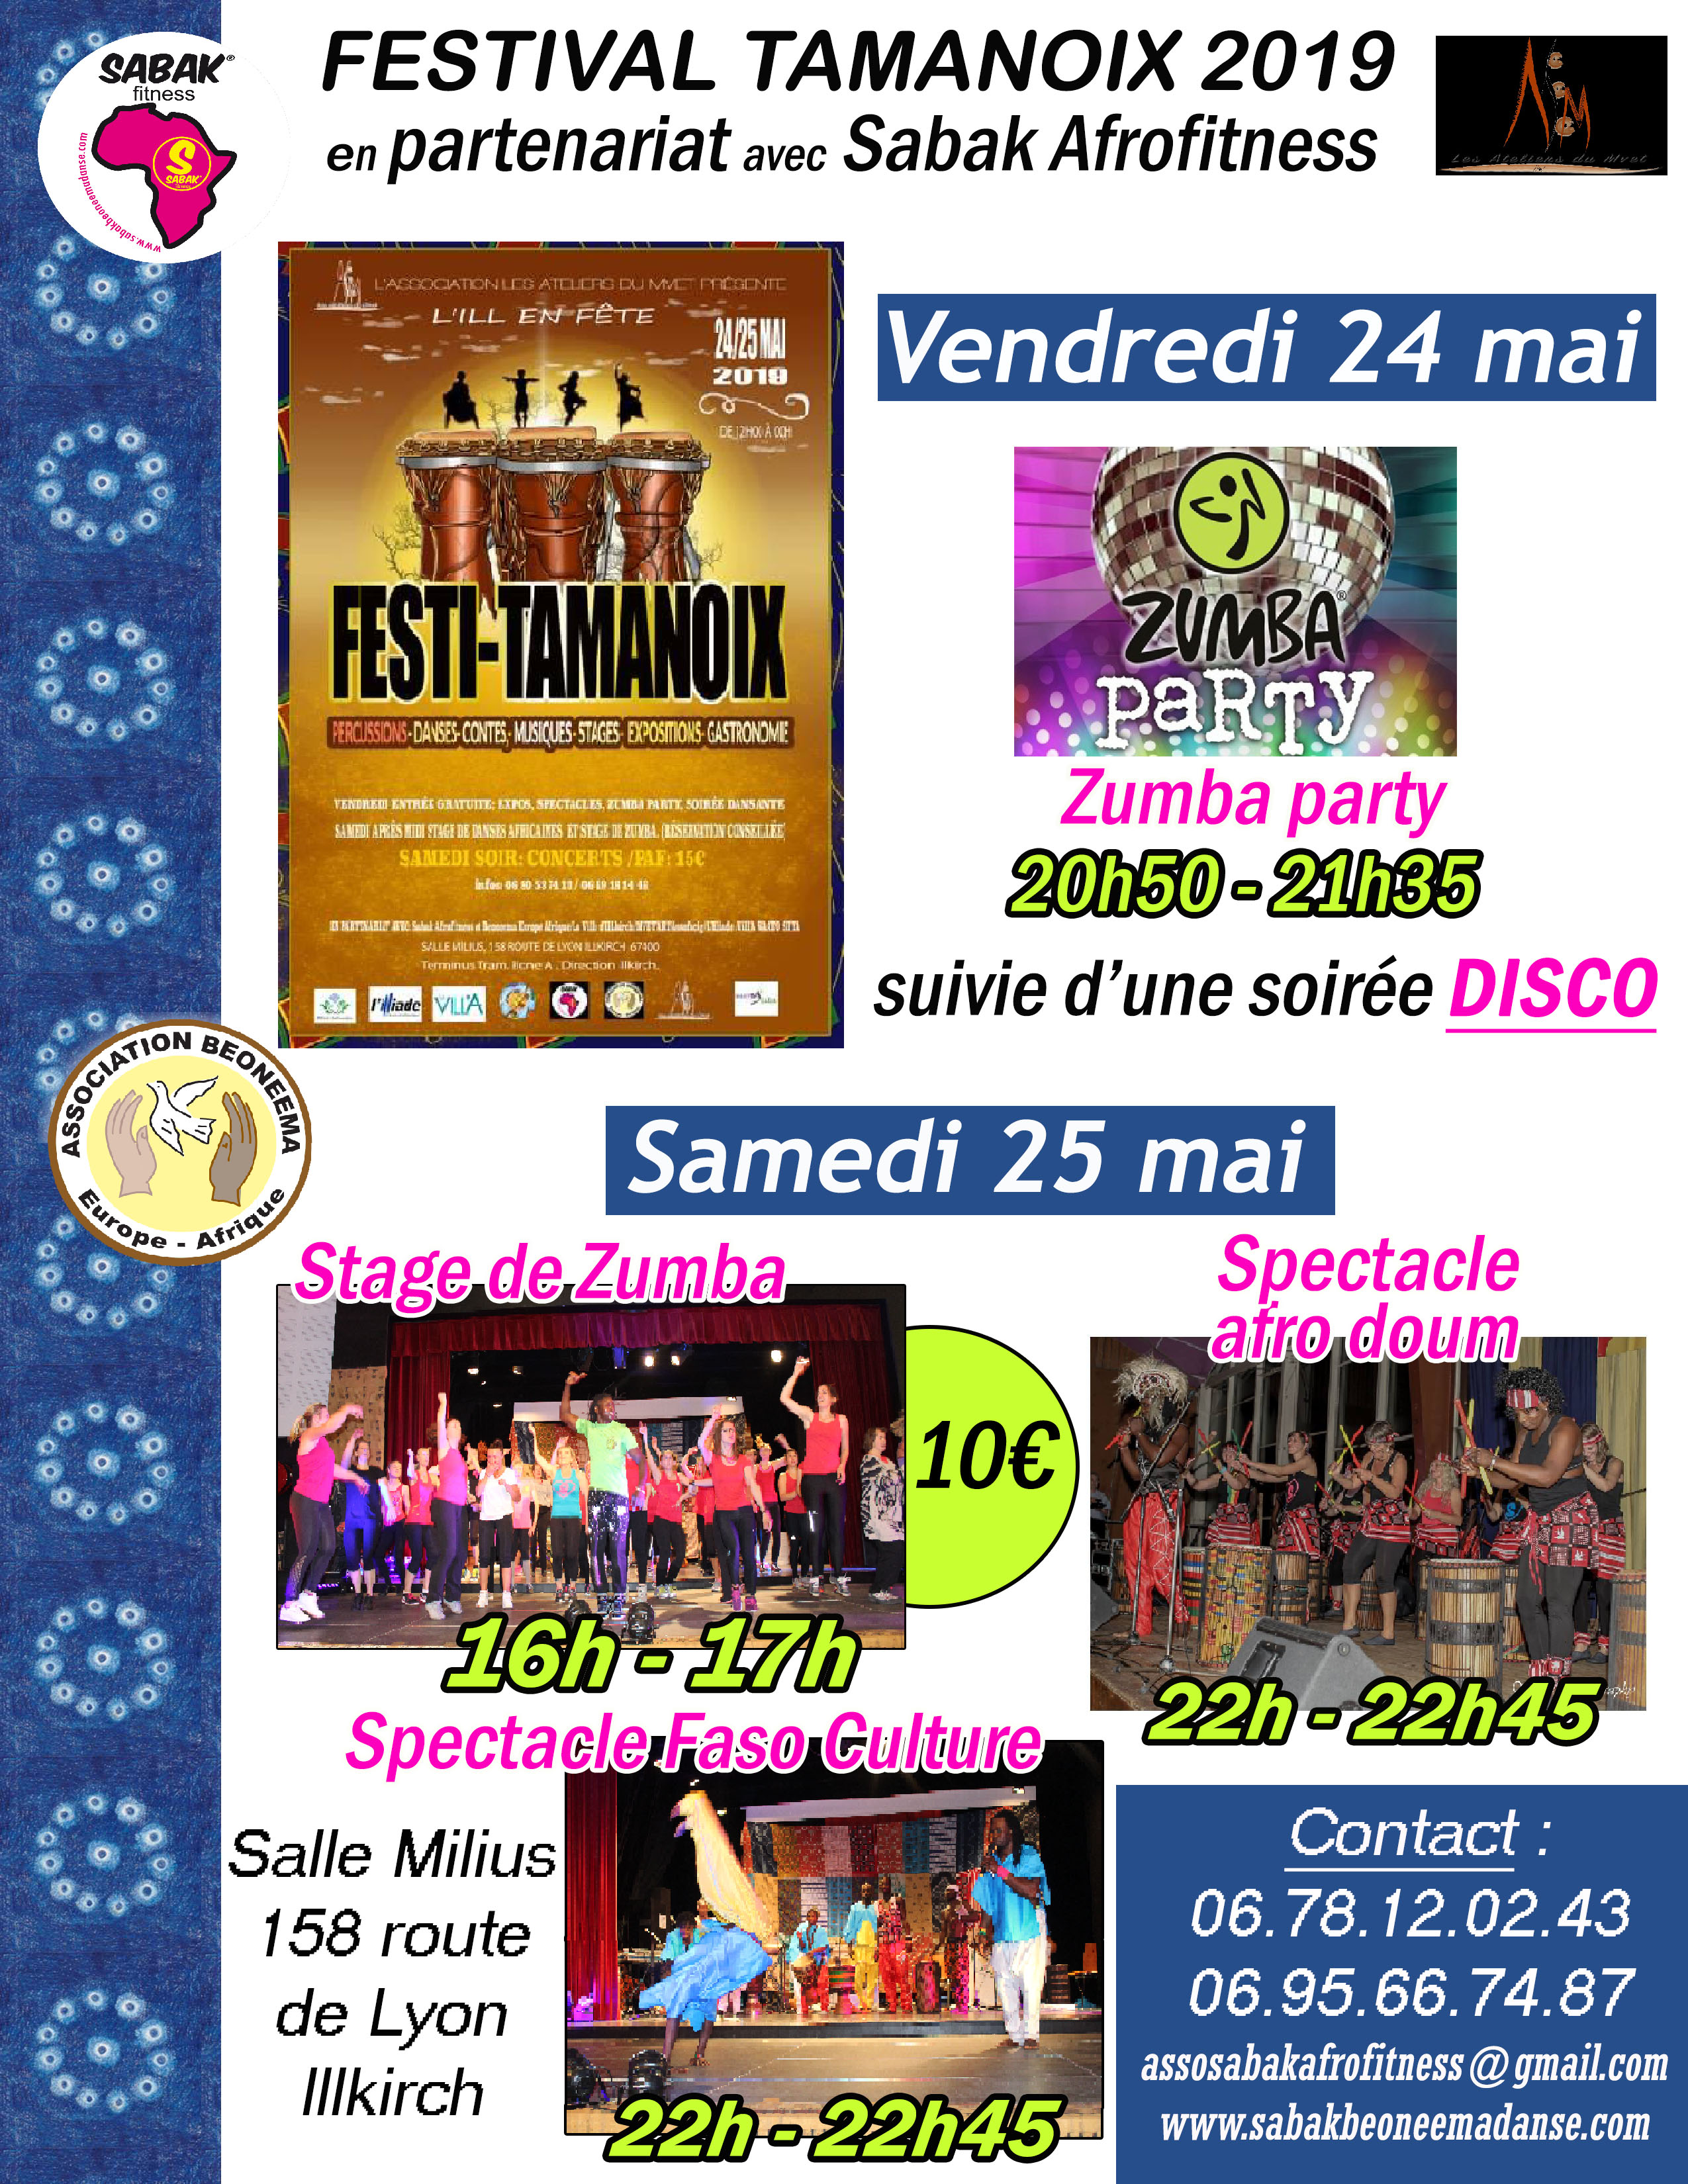 FESTIVAL TAMANOIX À ILLKIRCH les 24 & 25 MAI 2019